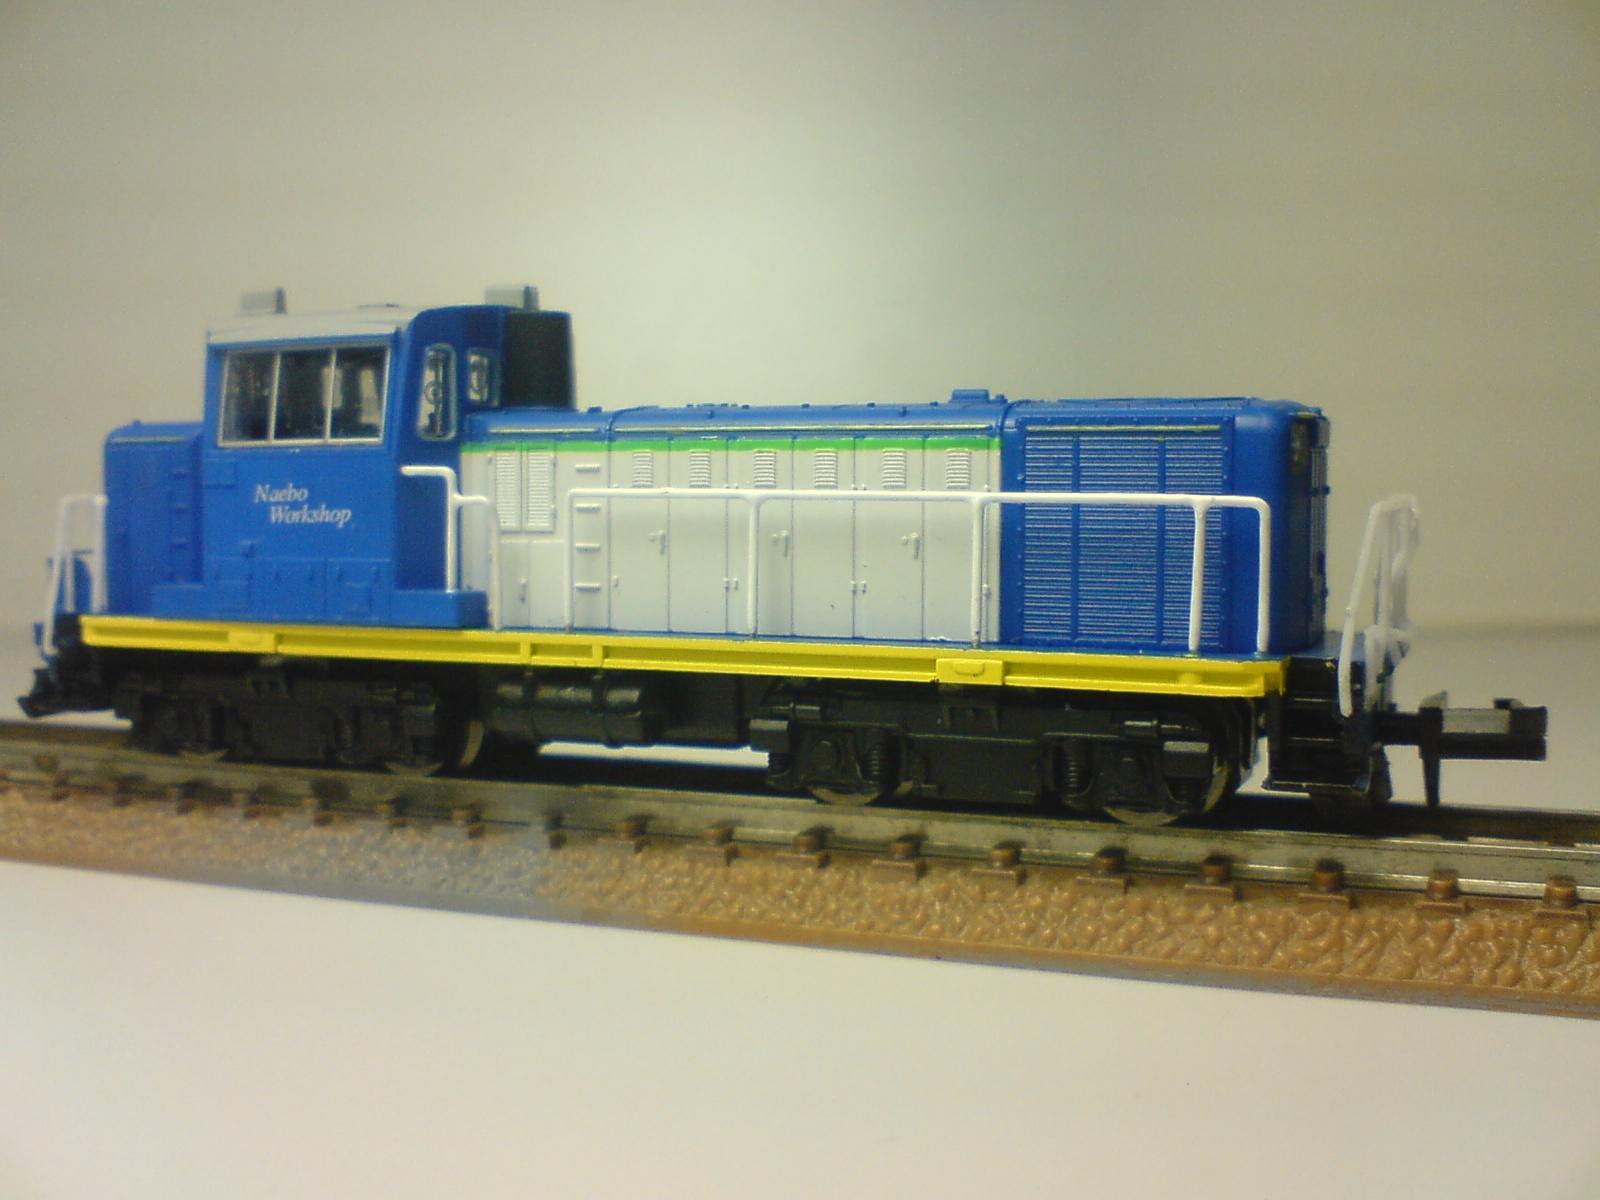 Kc380048